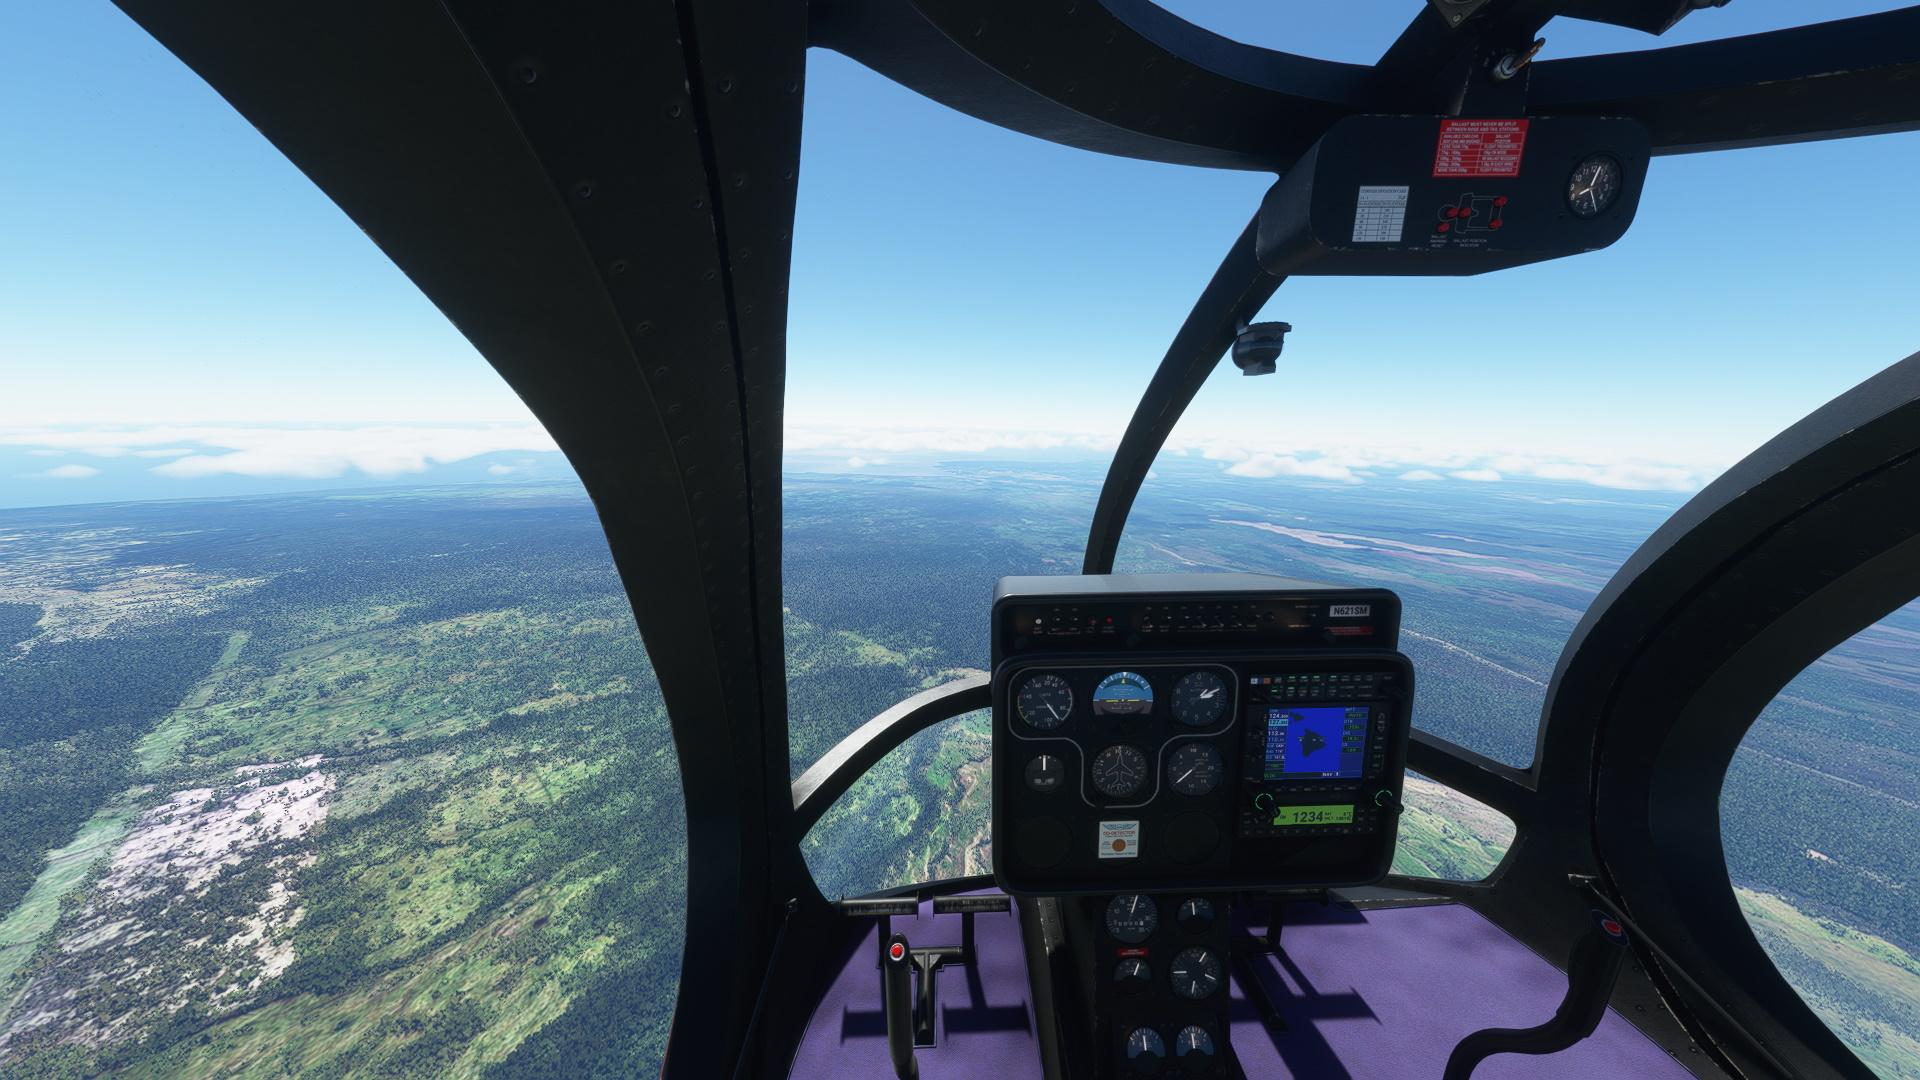 Microsoft Flight Simulator Ea 7 Edgely Optica flight gameplay review